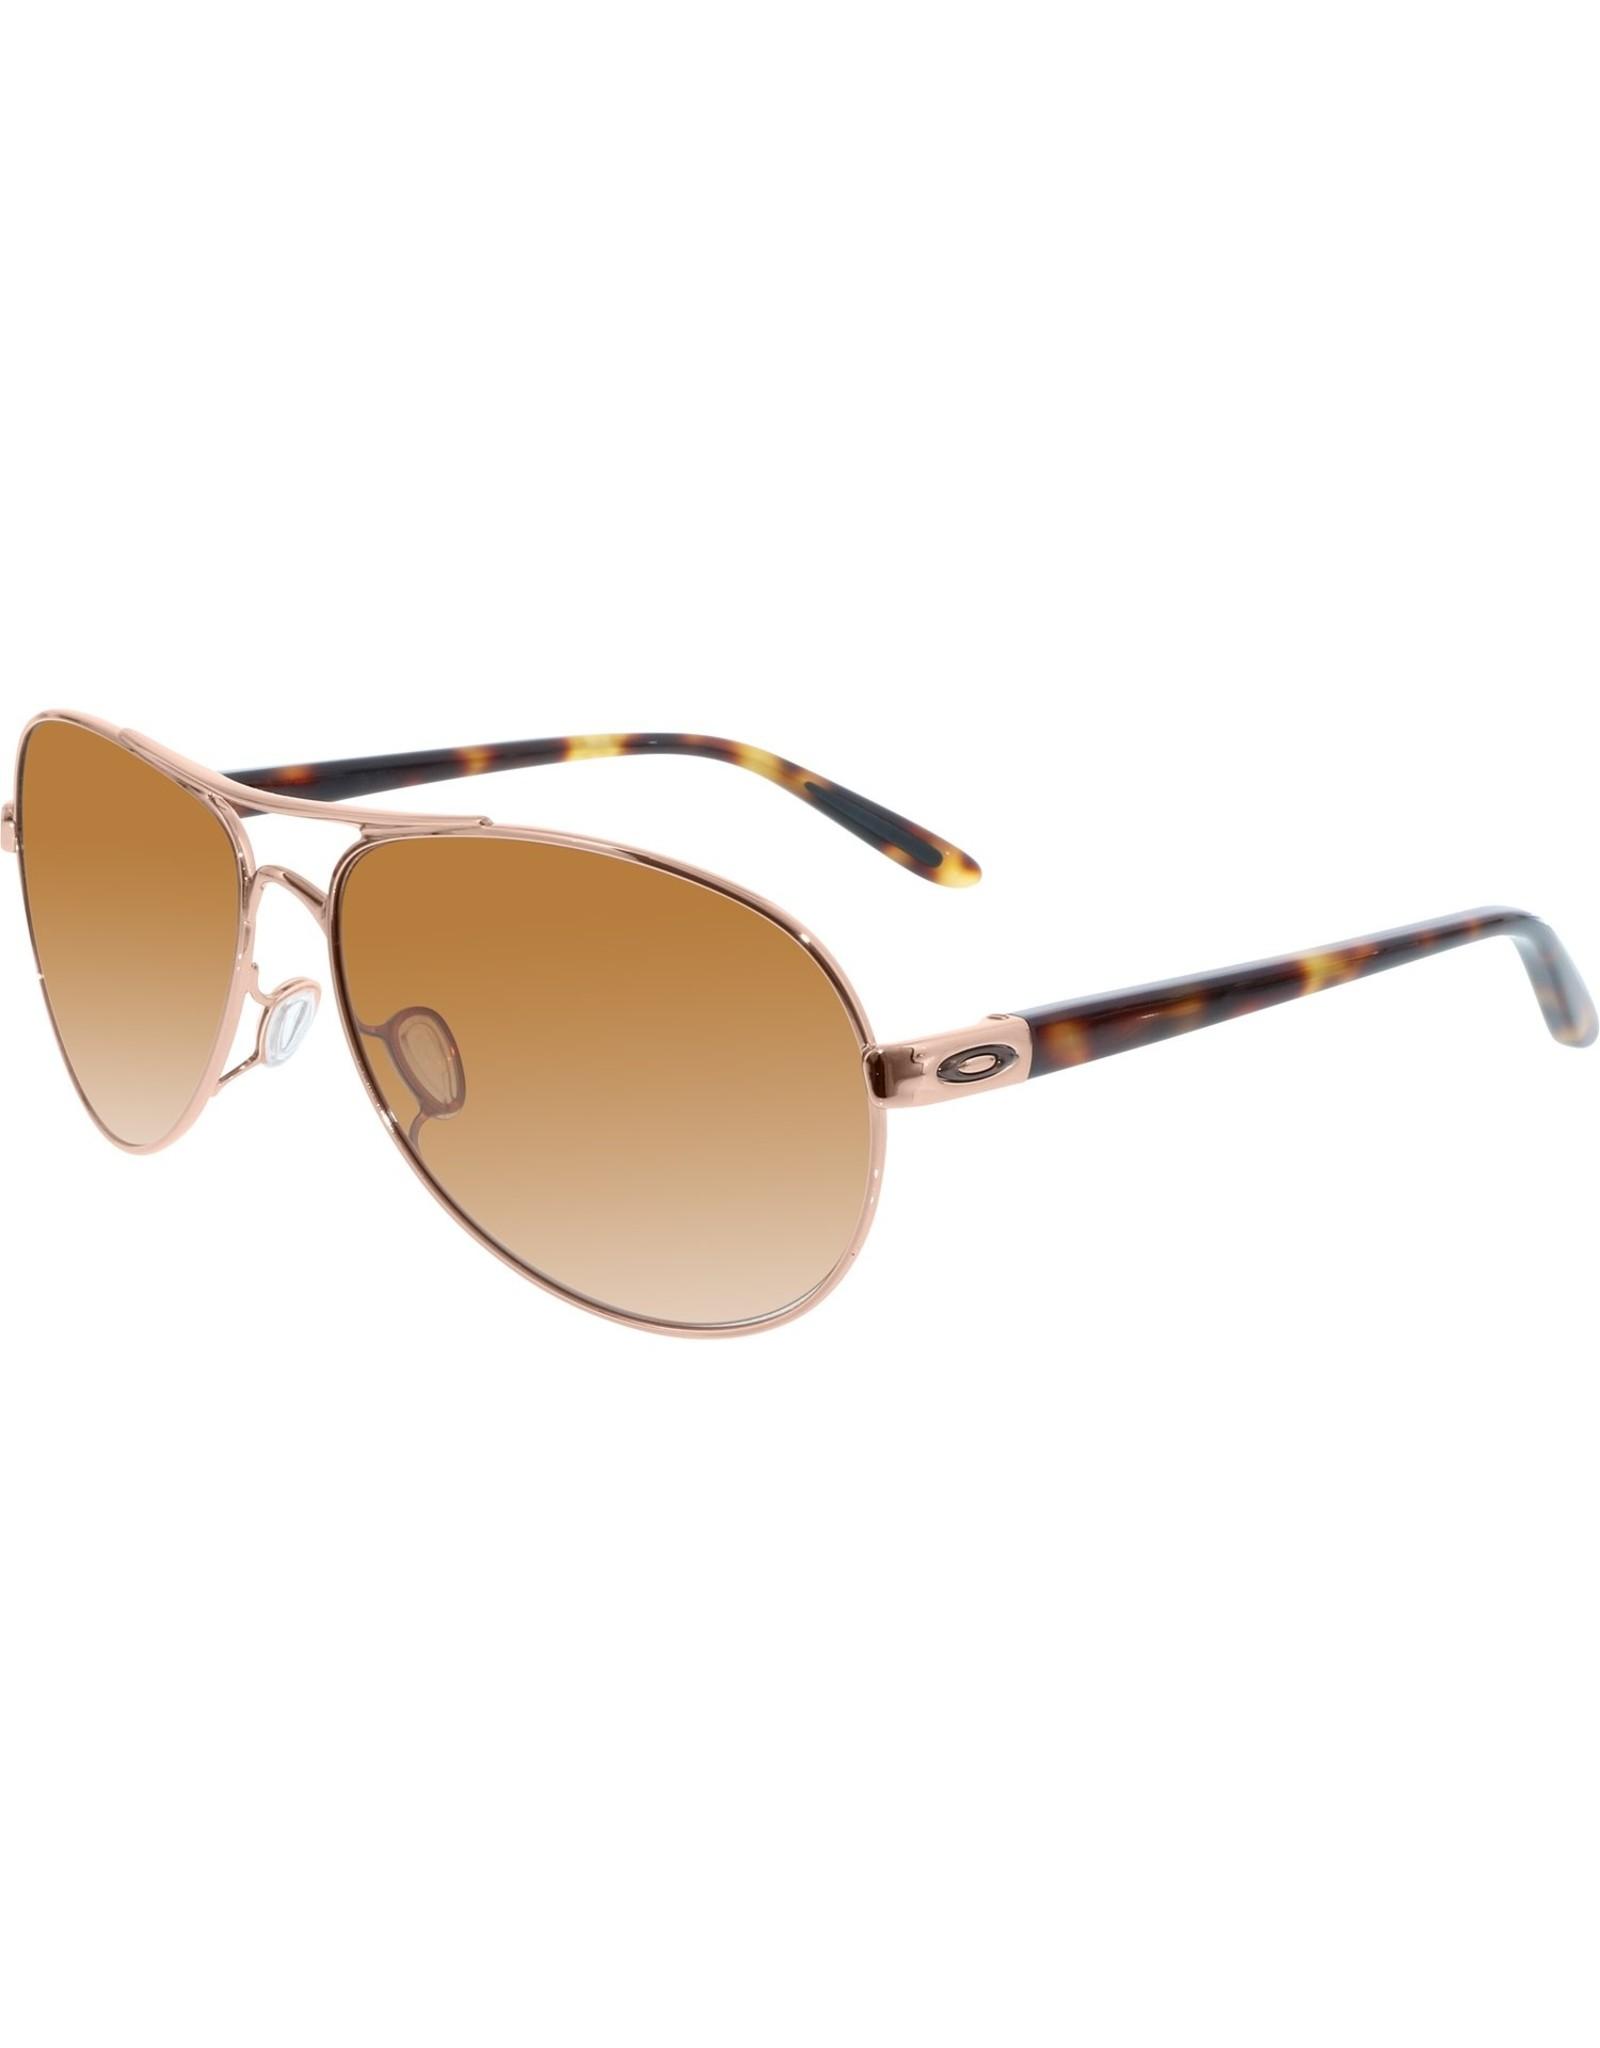 Oakley womens sunglasses FEEDBACK rose gold w/ vr50 brown gradient